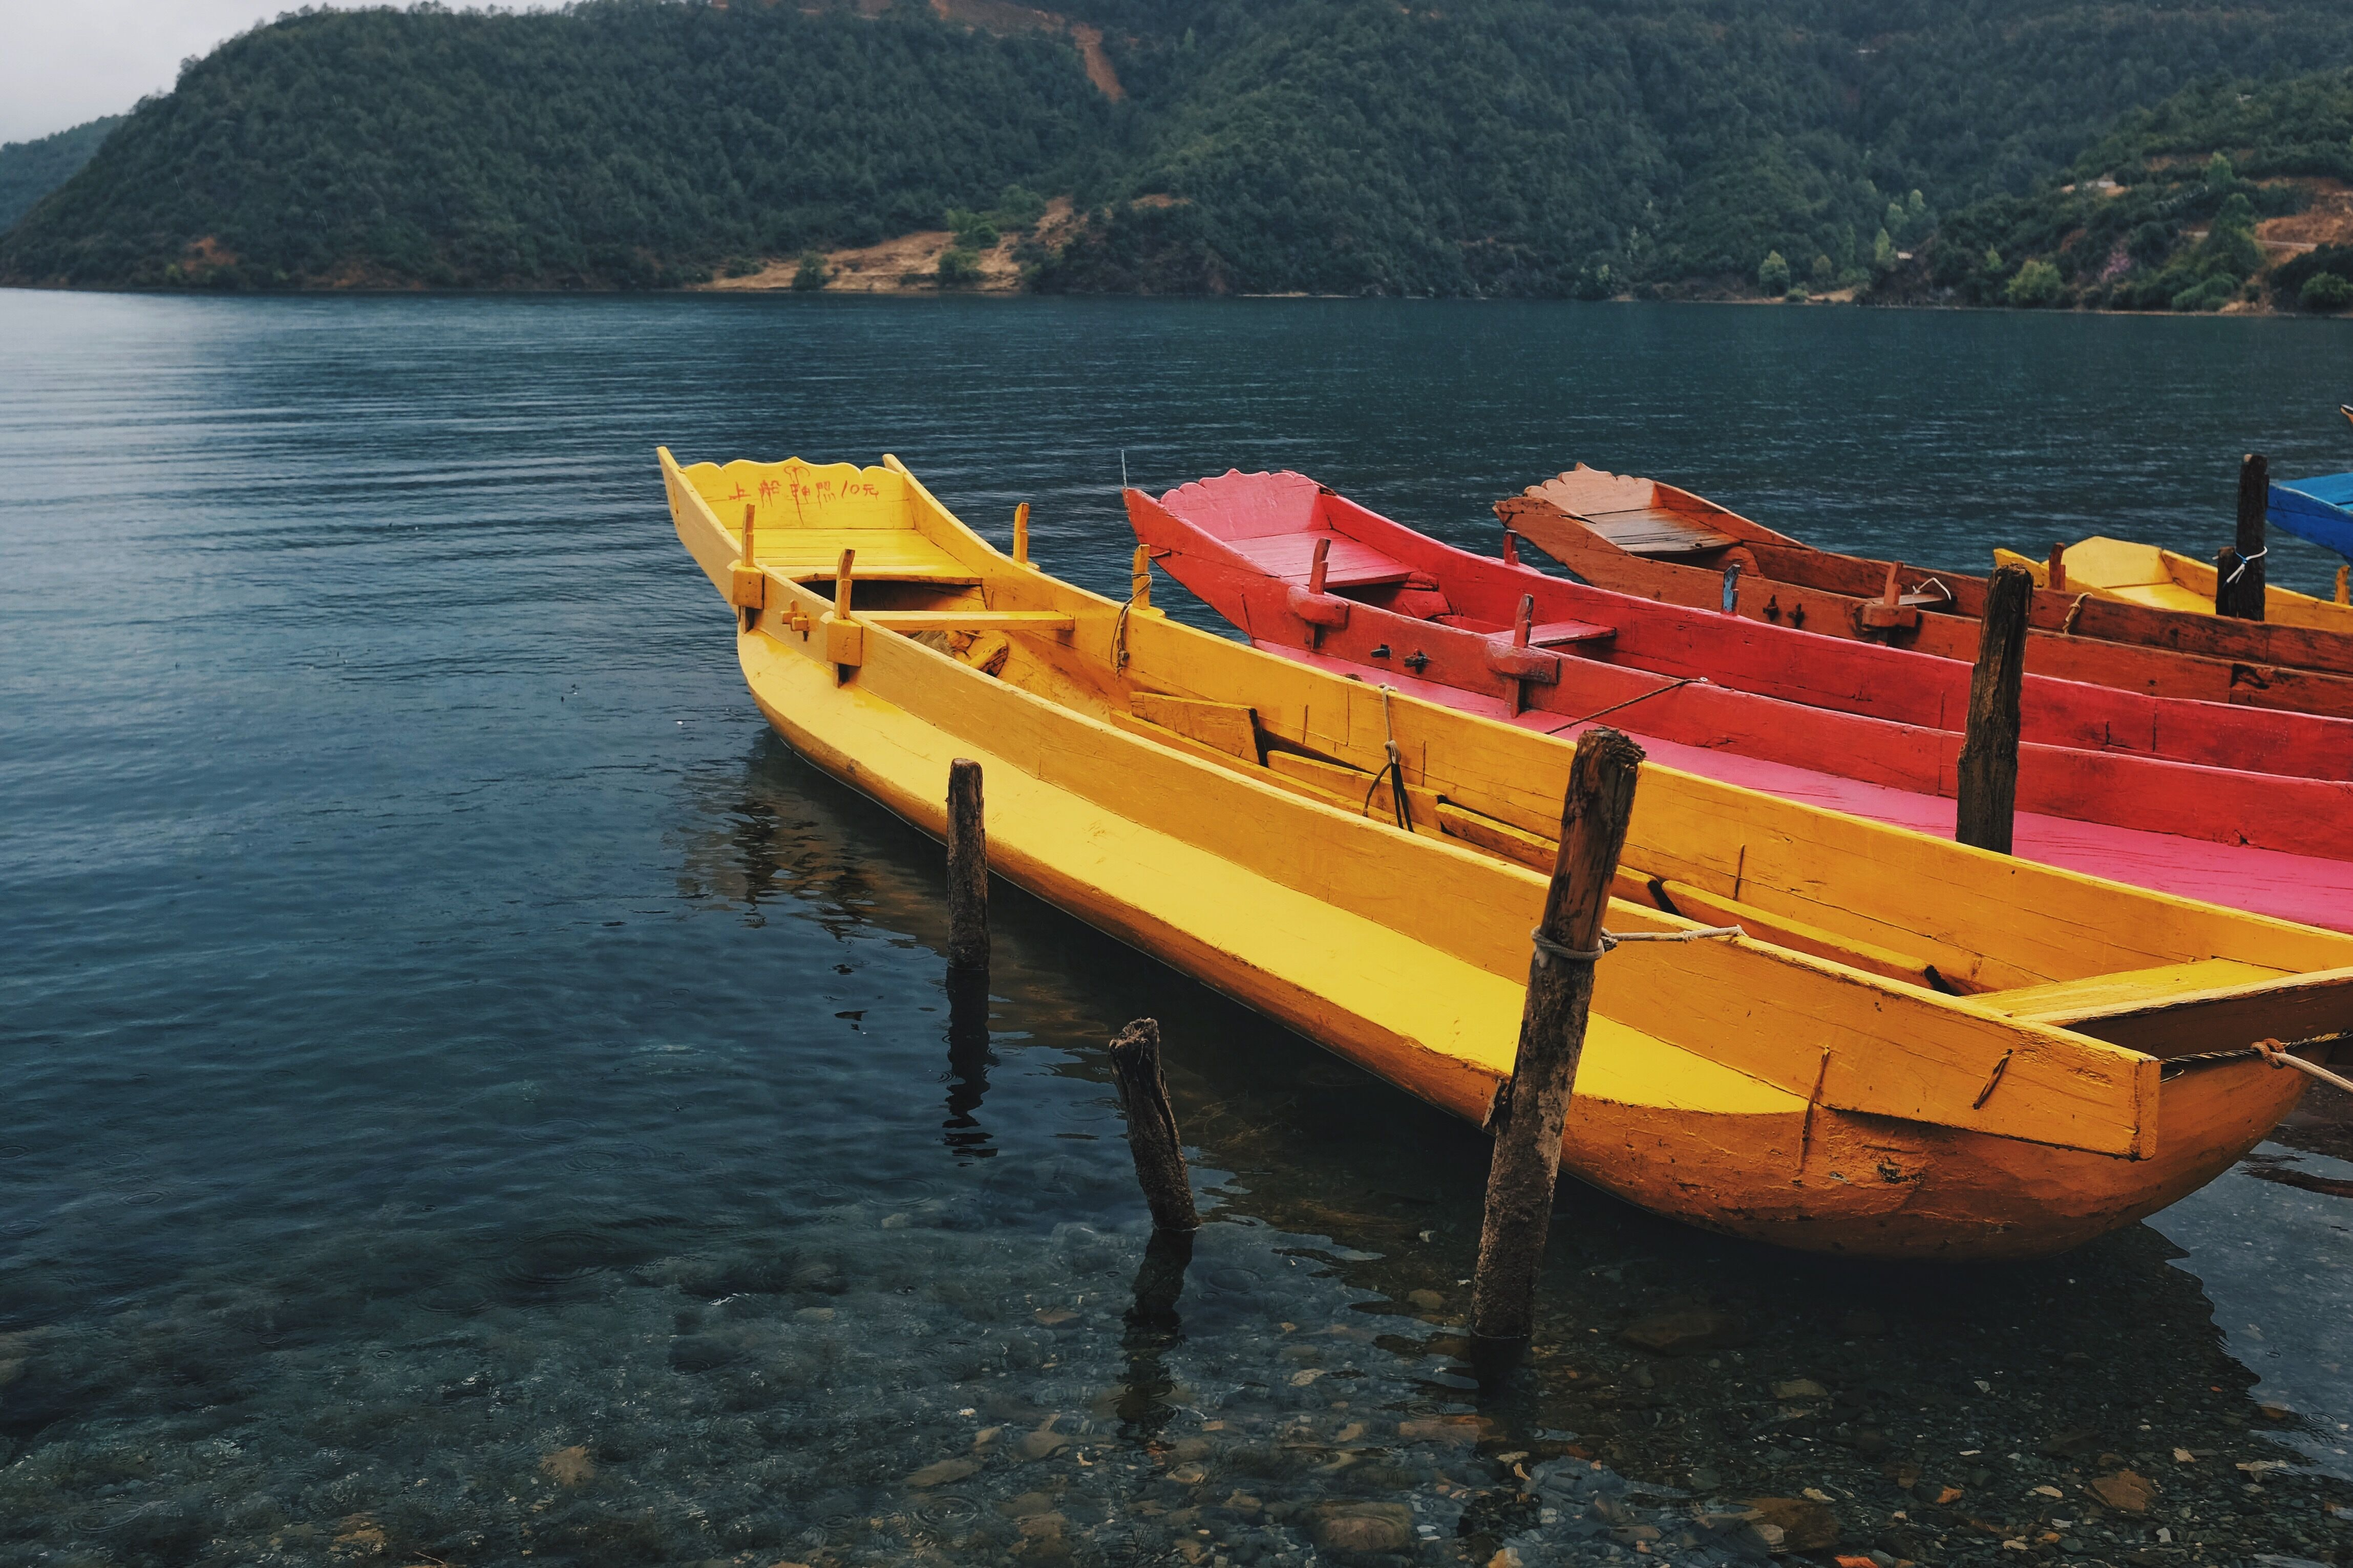 boats near seashore during daytime